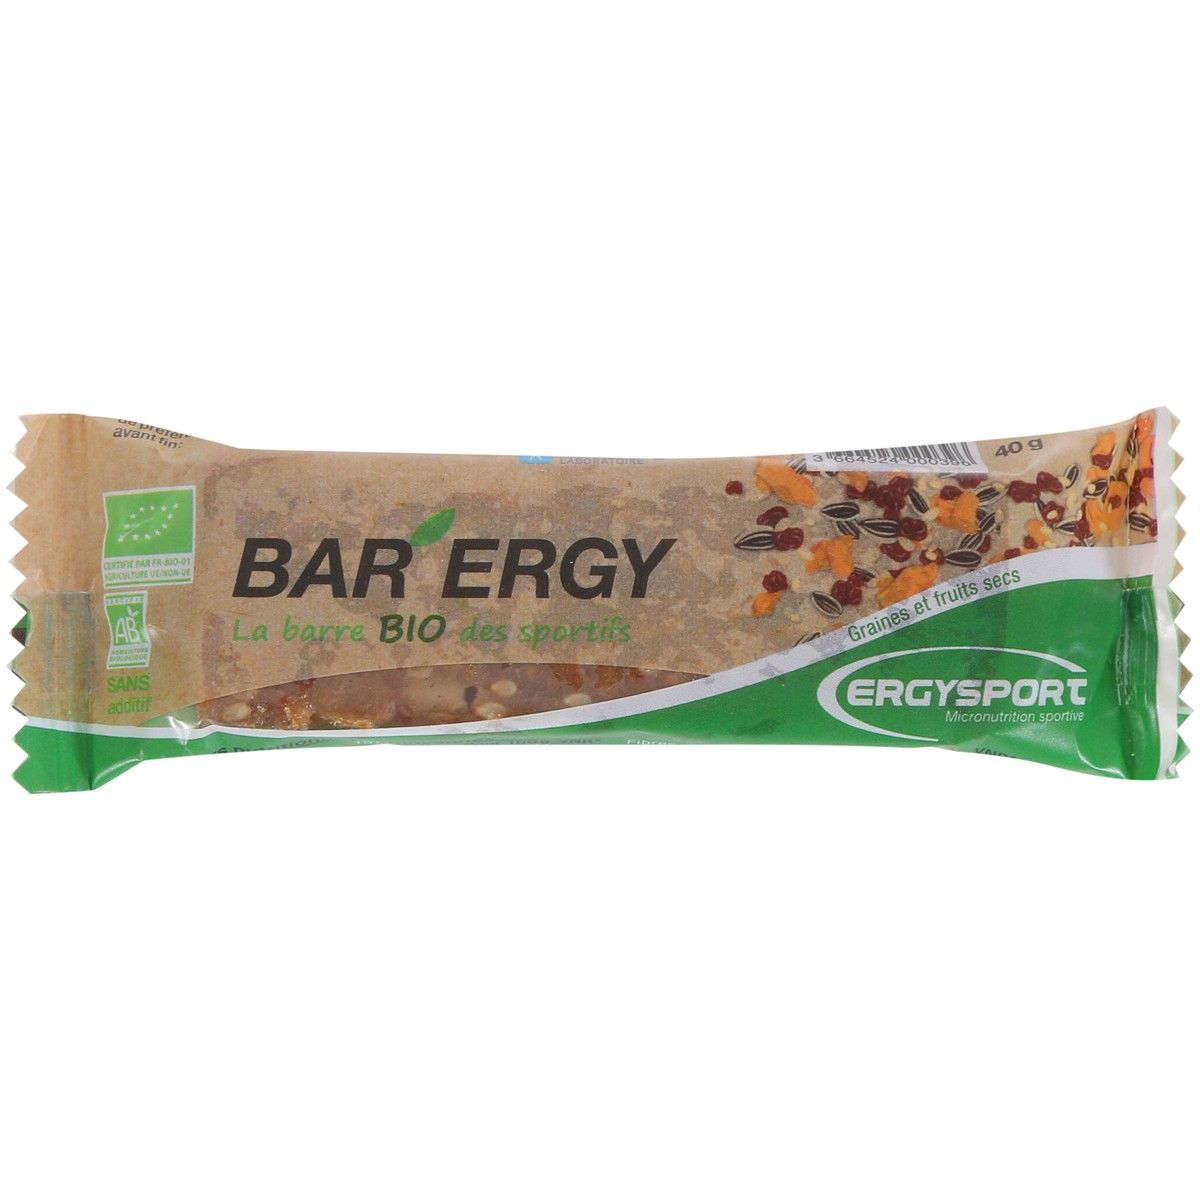 BAR ERGY BIO - 40G